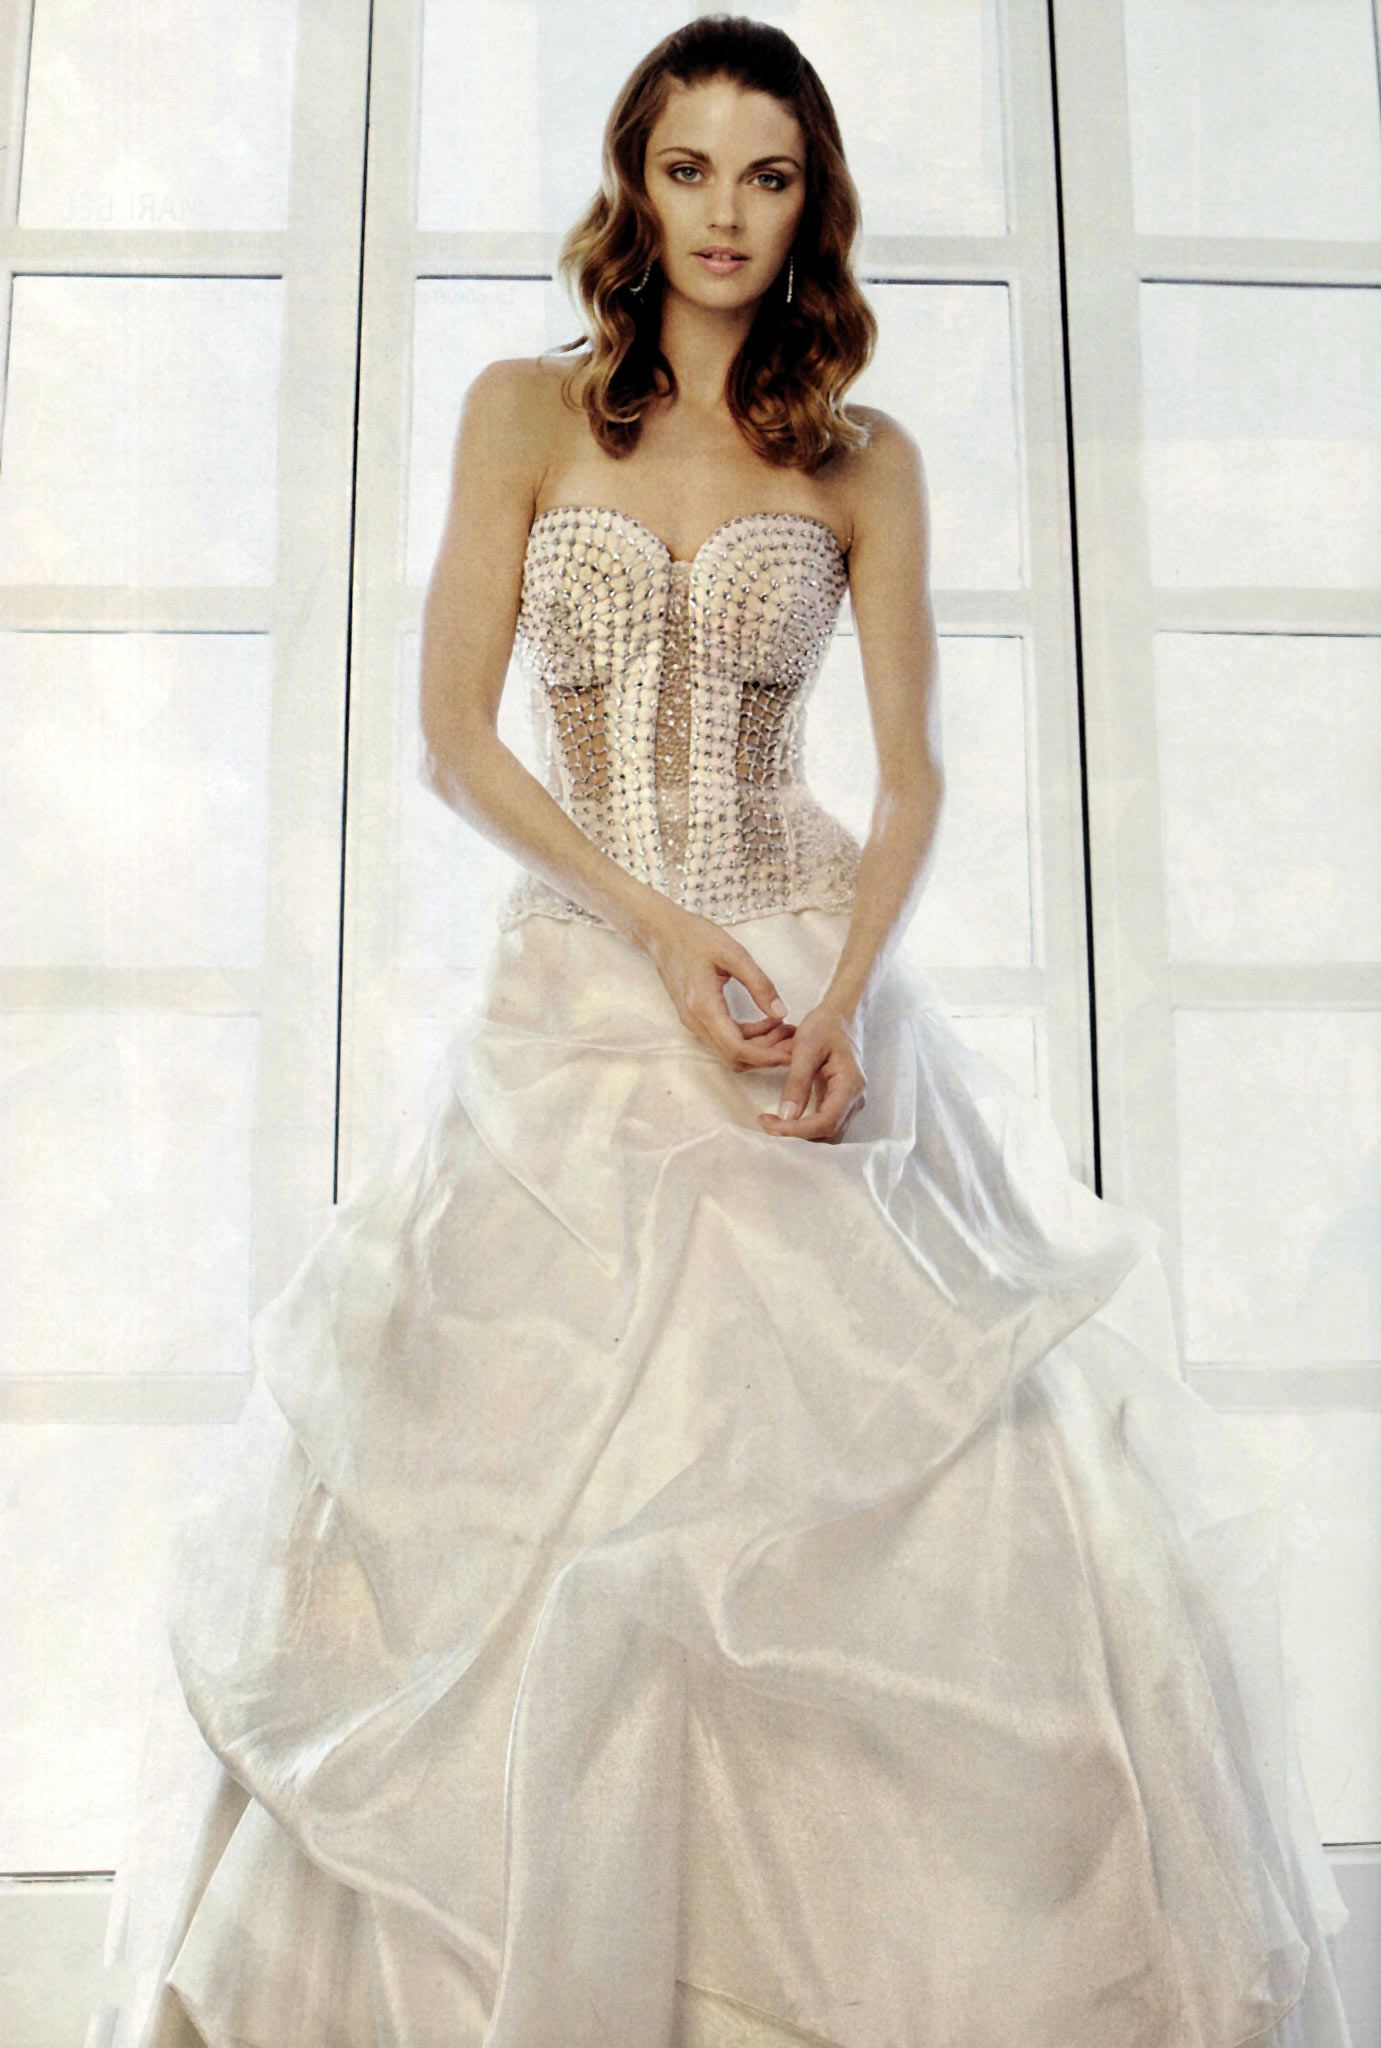 a8e8ea1925d2 Ο χρήστης Estelle Weddings (estelleweddings) στο Pinterest